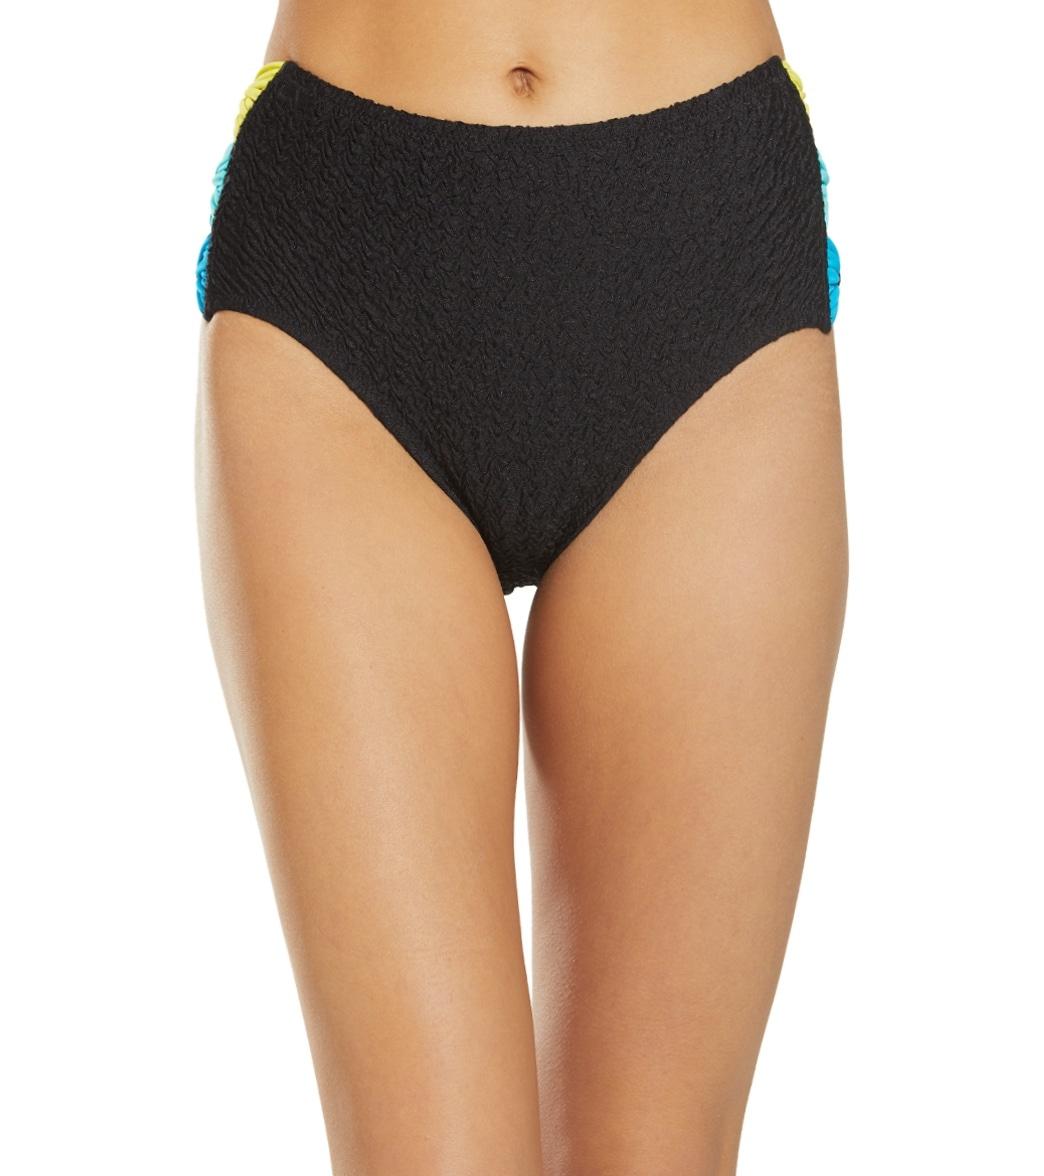 Coco Rave Material Gurl High Leg Taye Bow Bikini Bottom